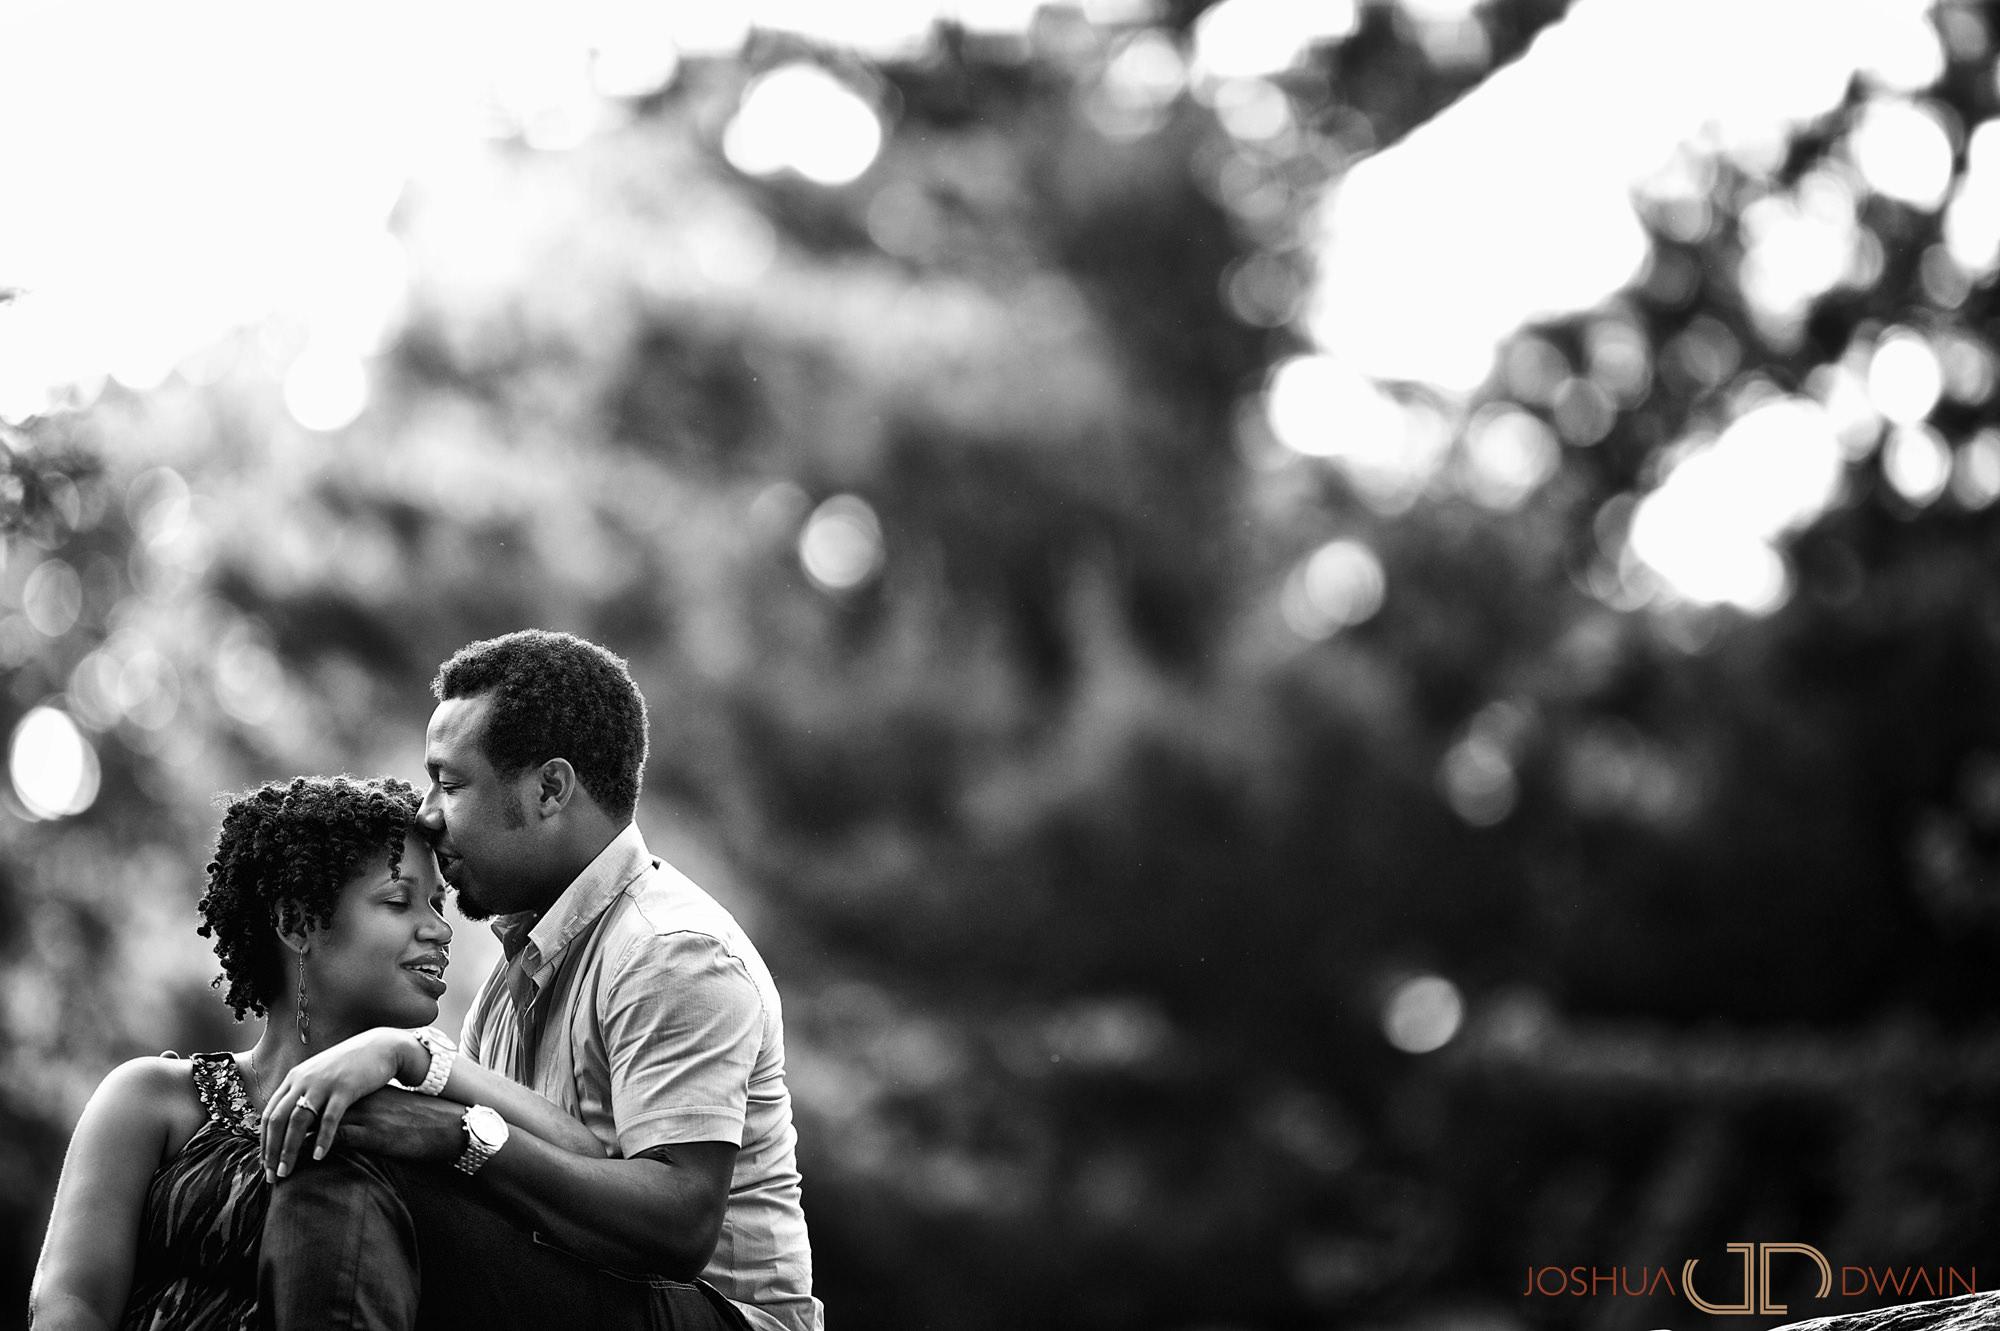 betty-garnel-001-central-park-new-york-city-ny-engagement-photographer-joshua-dwain-20110527_bg_009